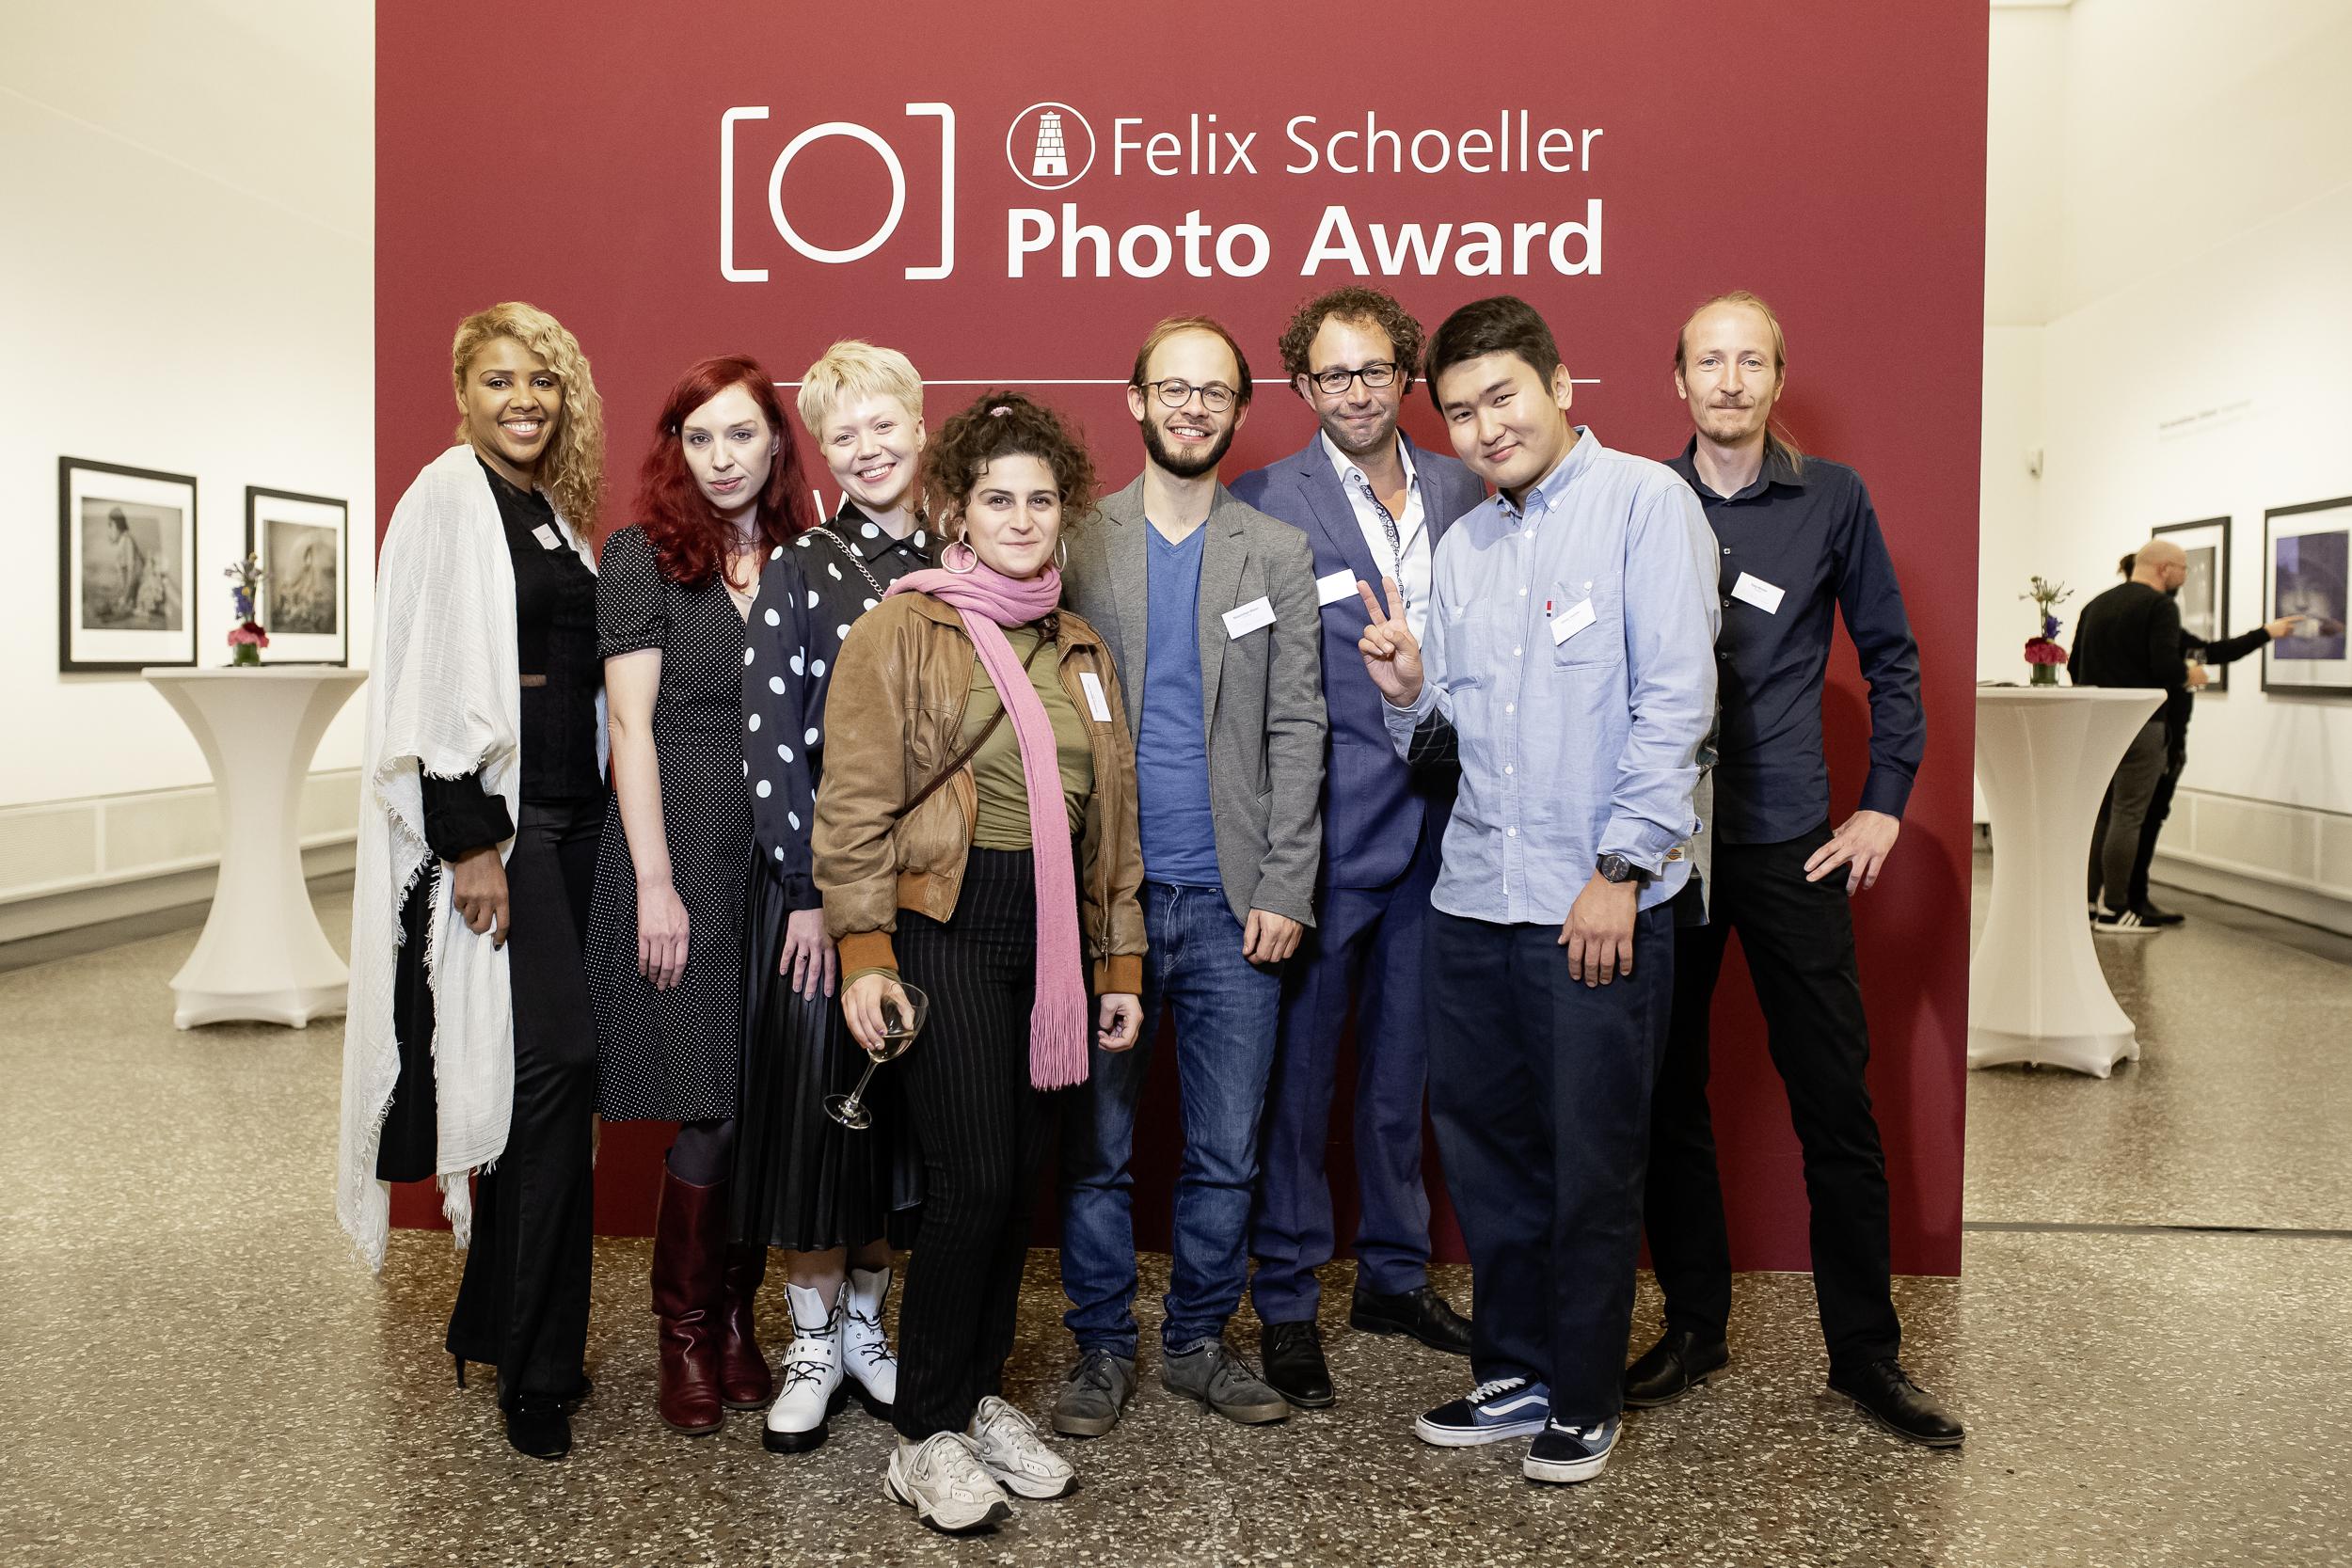 Felix Schoeller Photo Award 2019: Toby Binder ist Gold Award Gewinner, Maximilian Mann gewinnt den Nachwuchsförderpreis